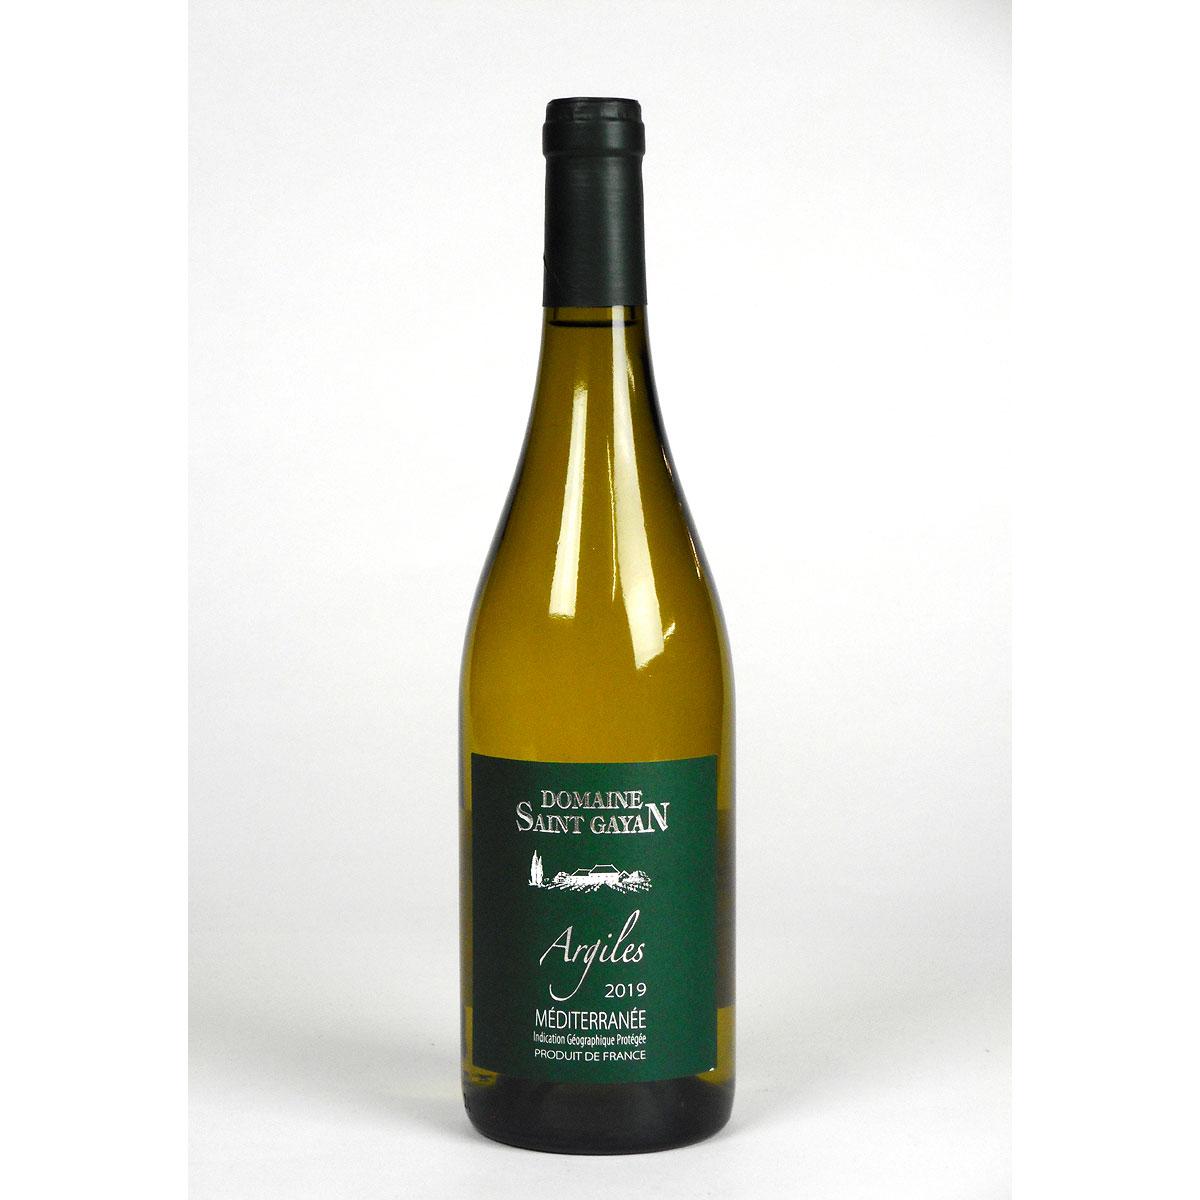 IGP Méditerranée: Domaine Saint Gayan 'Argiles' Blanc 2019 - Bottle